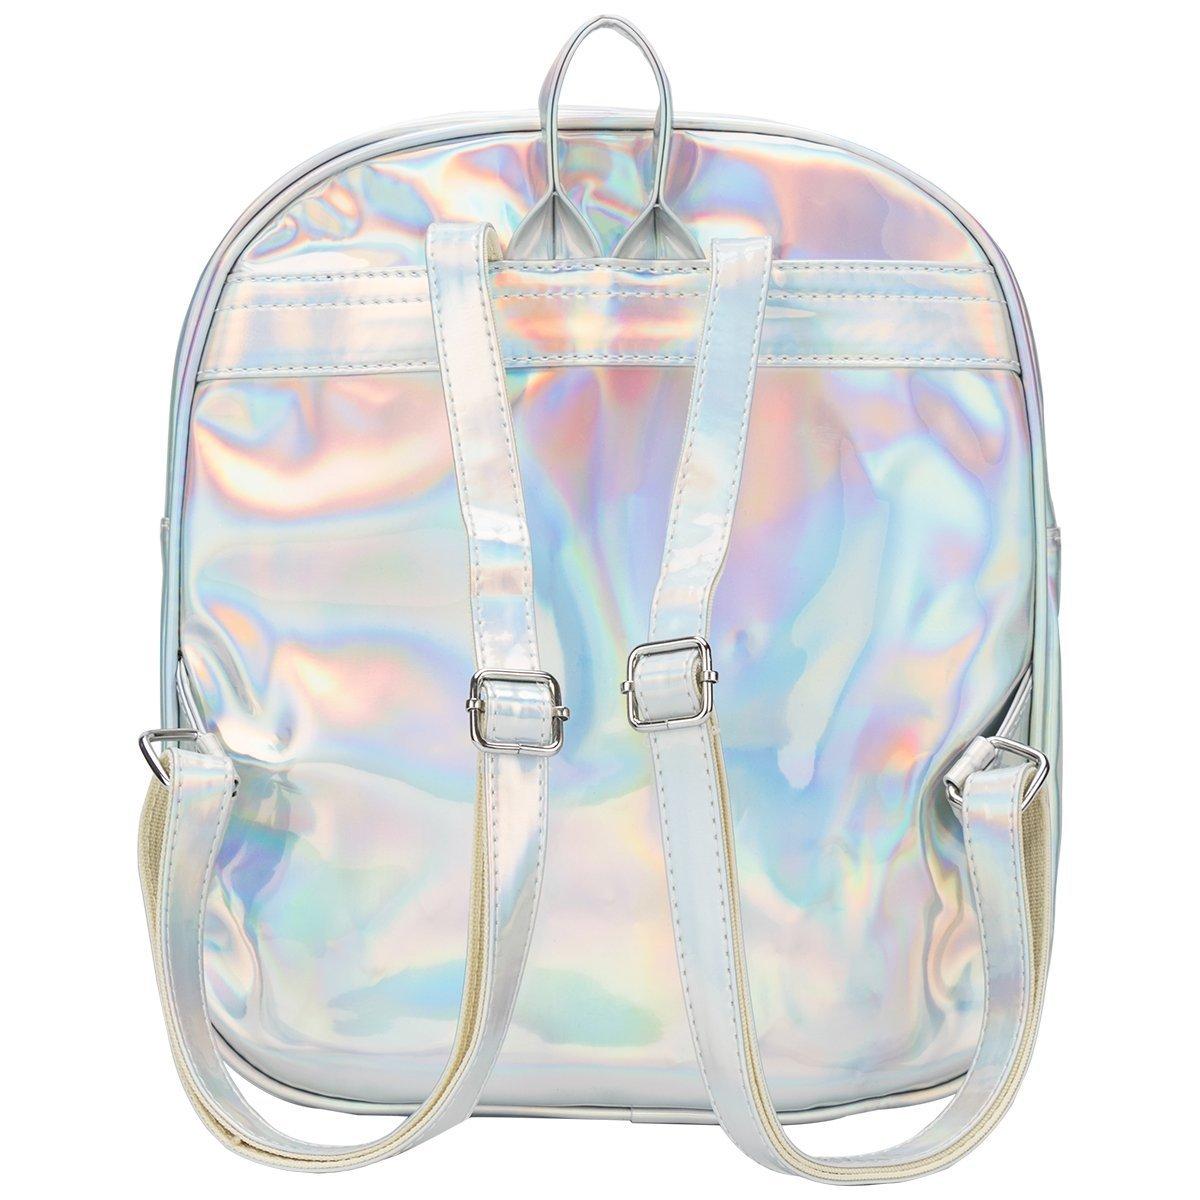 Girls Kawaii Bling Transparent Love Star School Bag Backpack (Star-Silver) by XSCOMSPORT (Image #3)